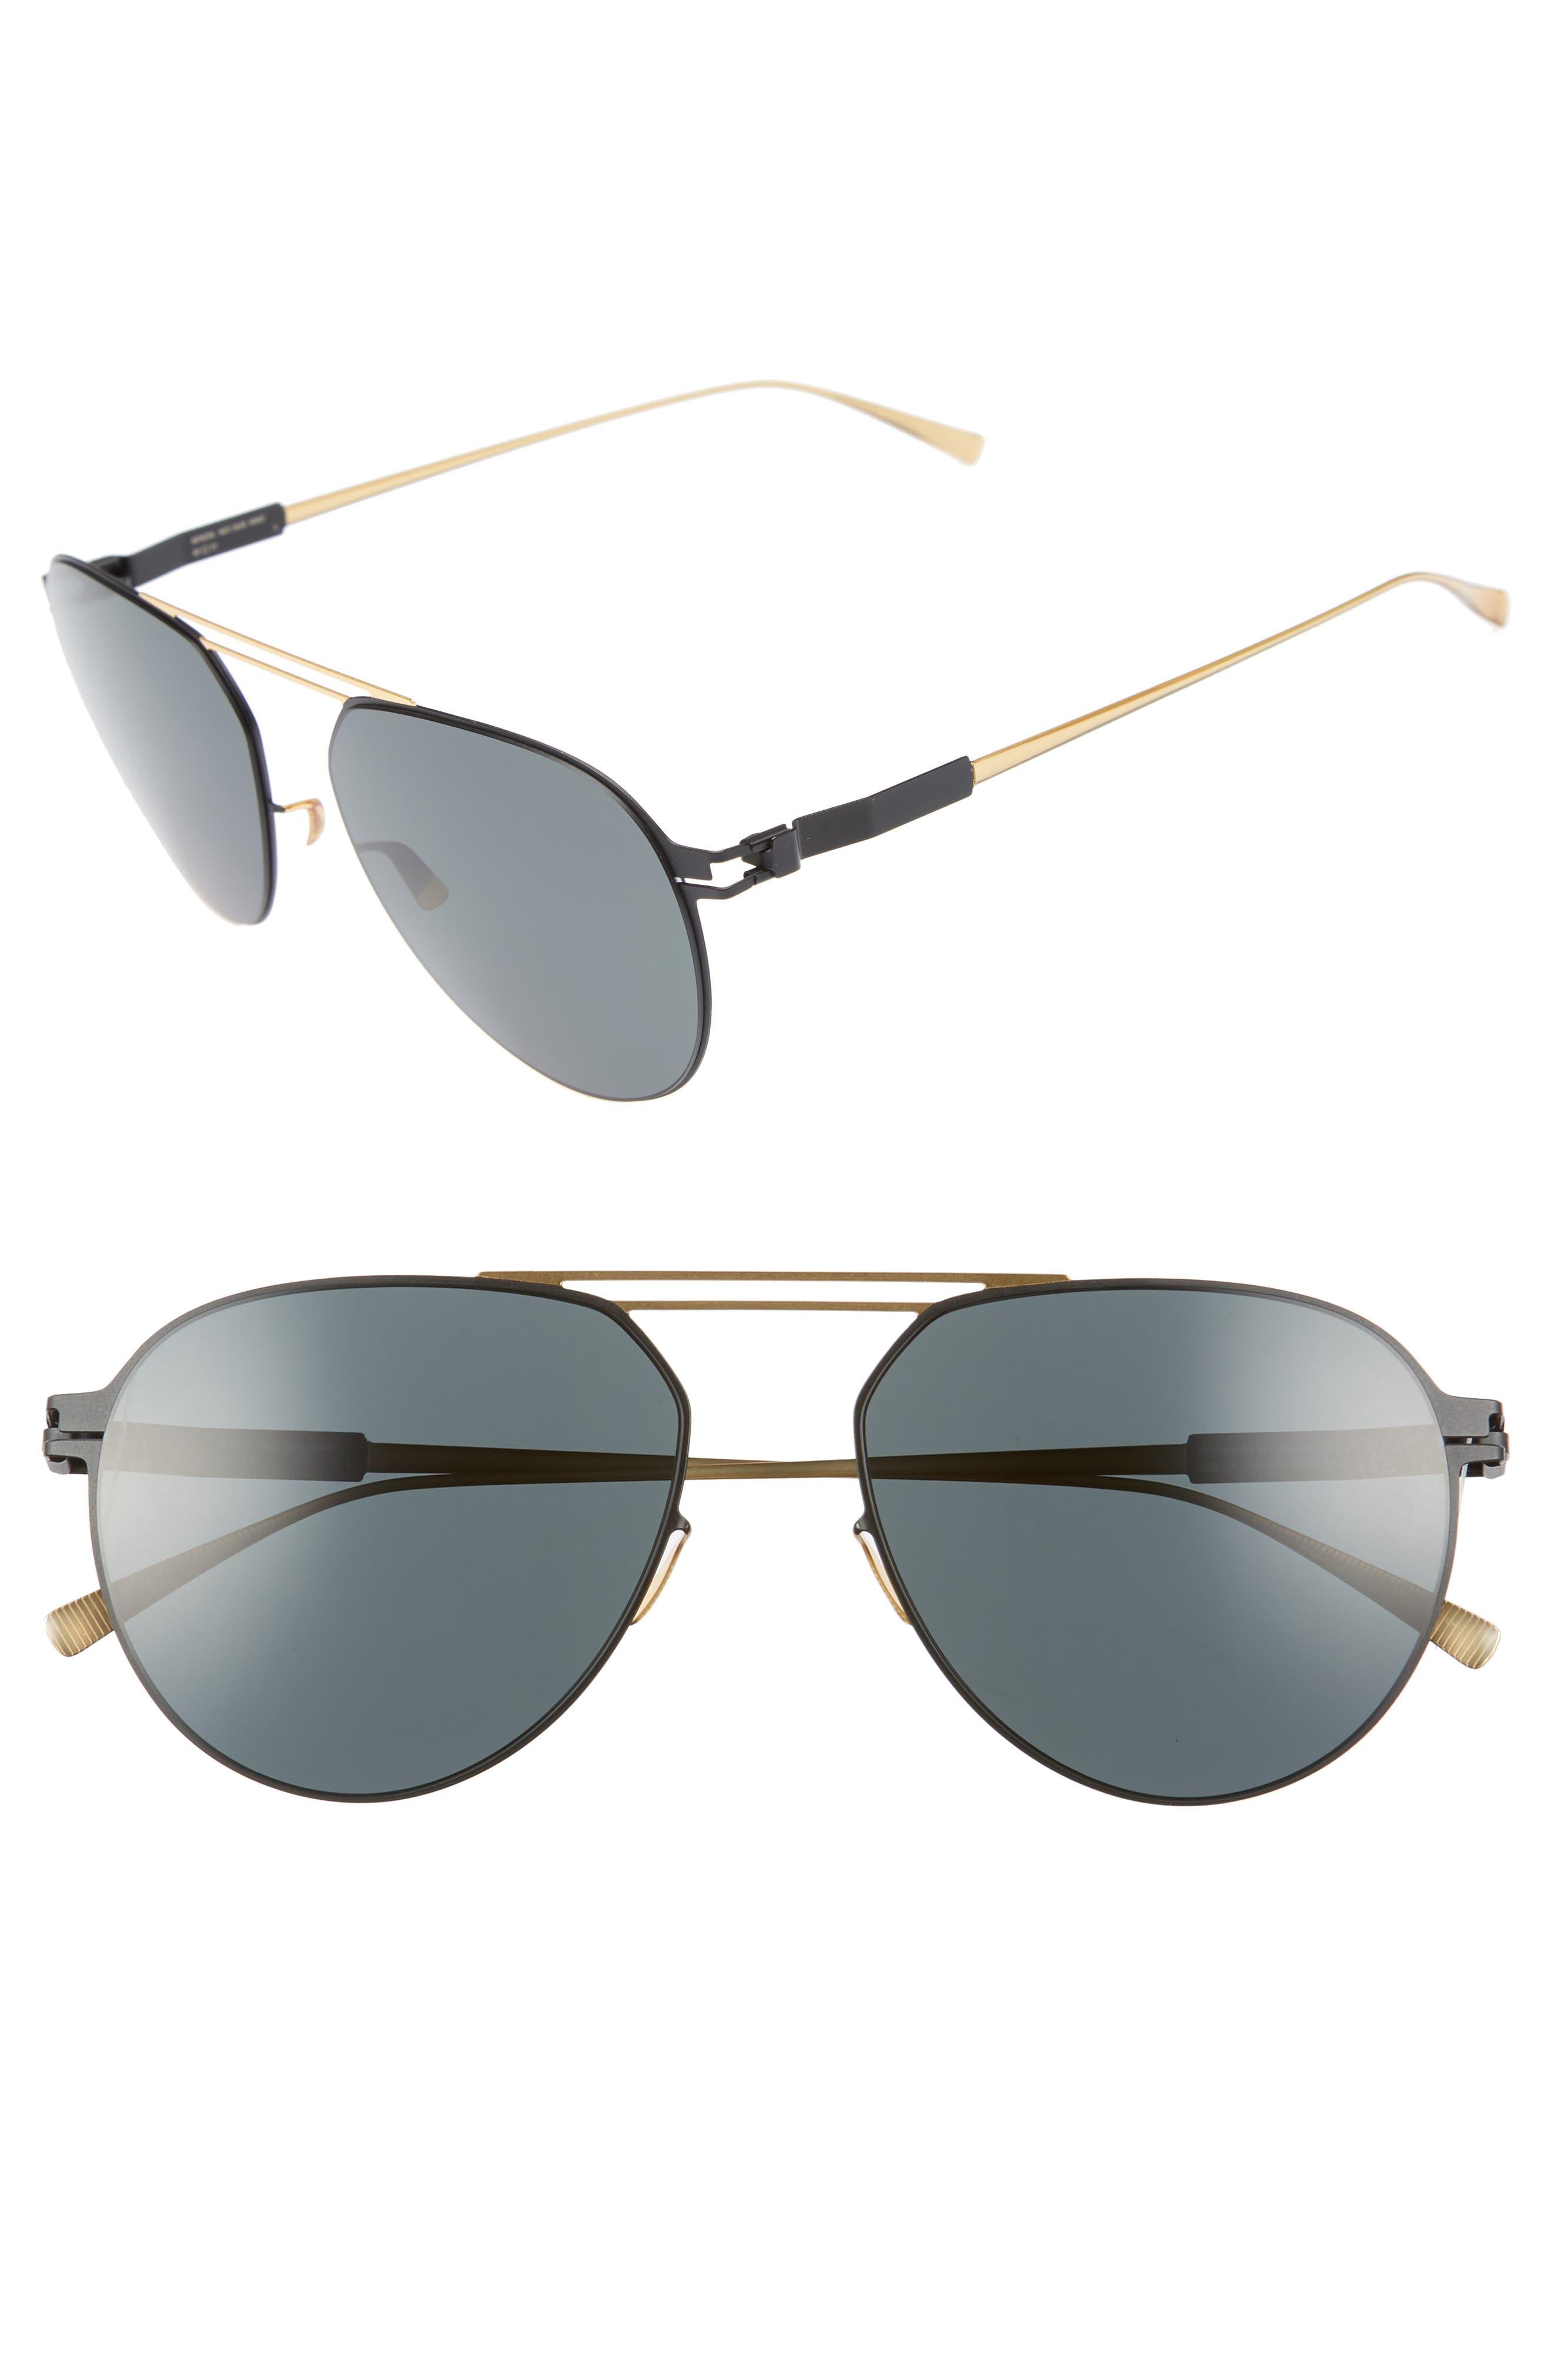 Nino 57mm Polarized Aviator Sunglasses,                             Main thumbnail 1, color,                             226